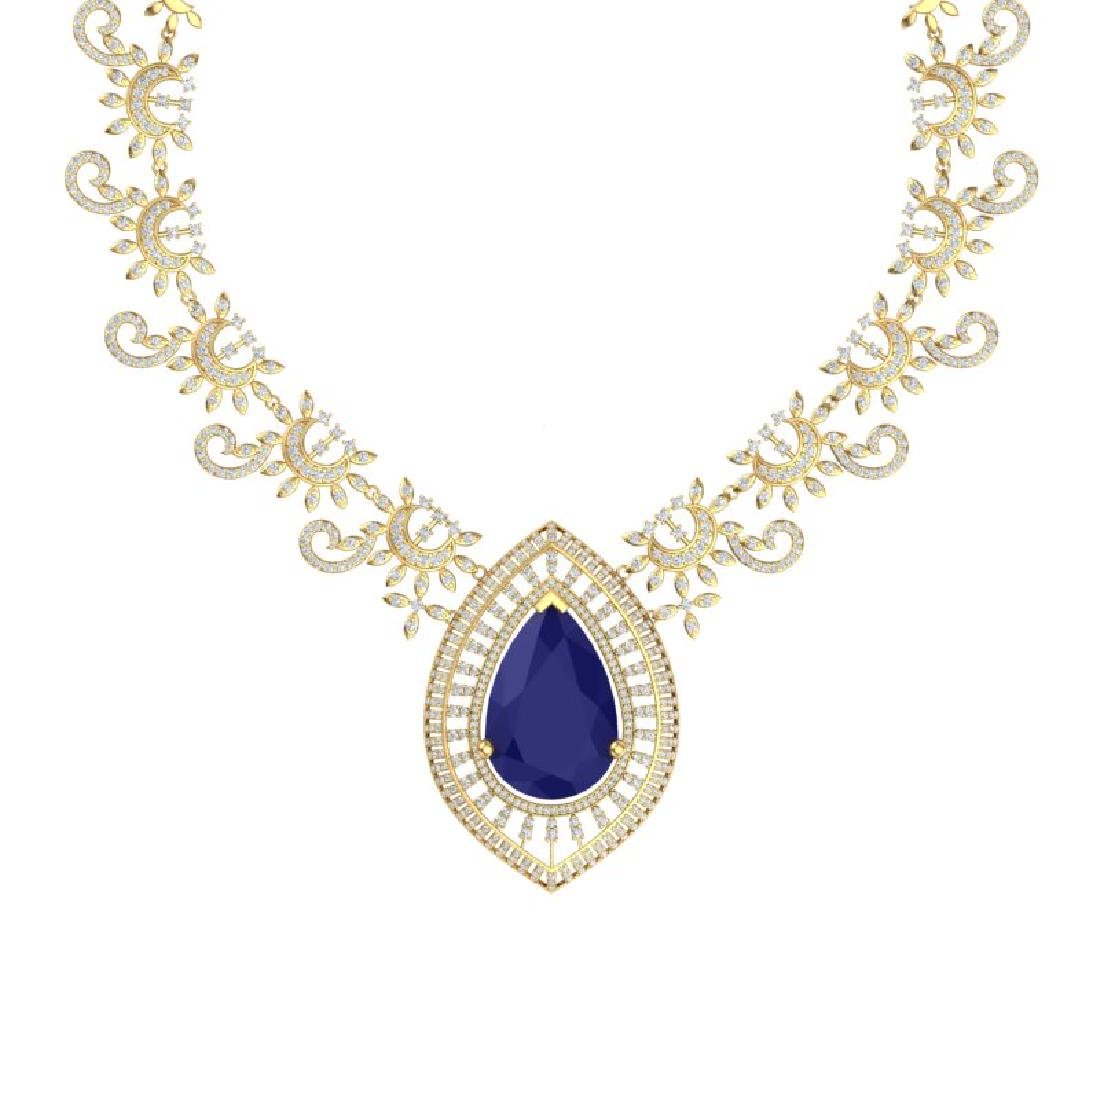 65.75 CTW Royalty Sapphire & VS Diamond Necklace 18K - 2